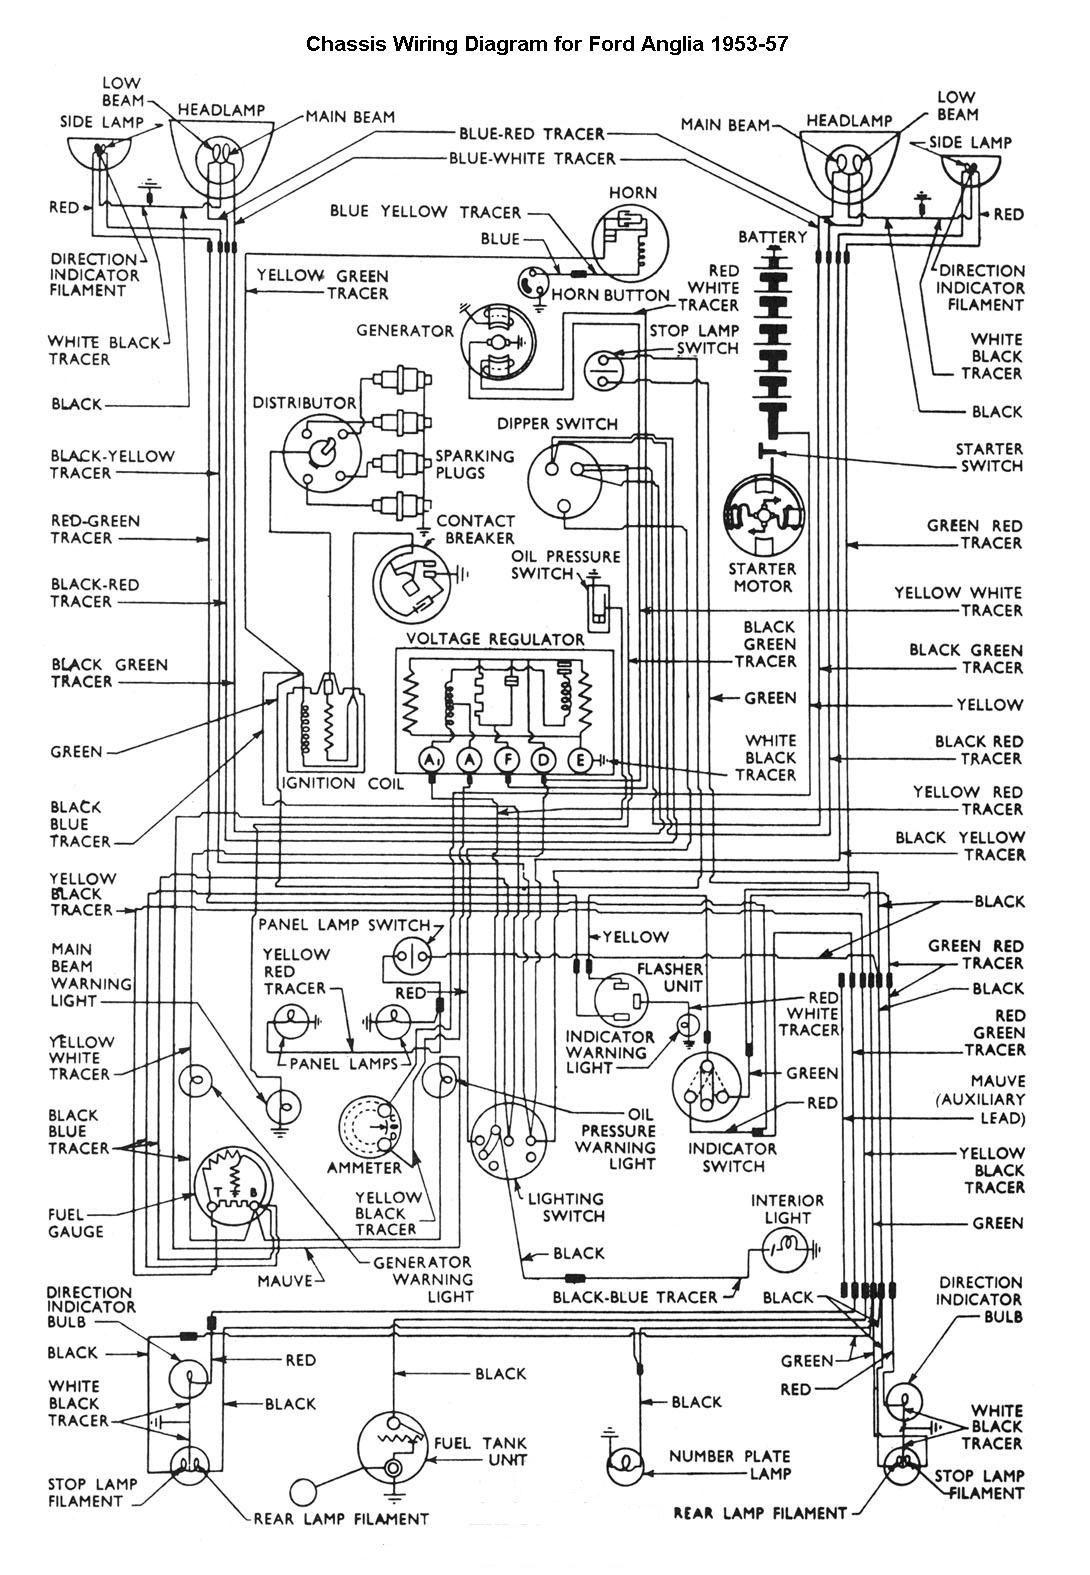 Car Wiring Diagram Electrical Wiring Diagram Electrical Diagram Electrical Wiring